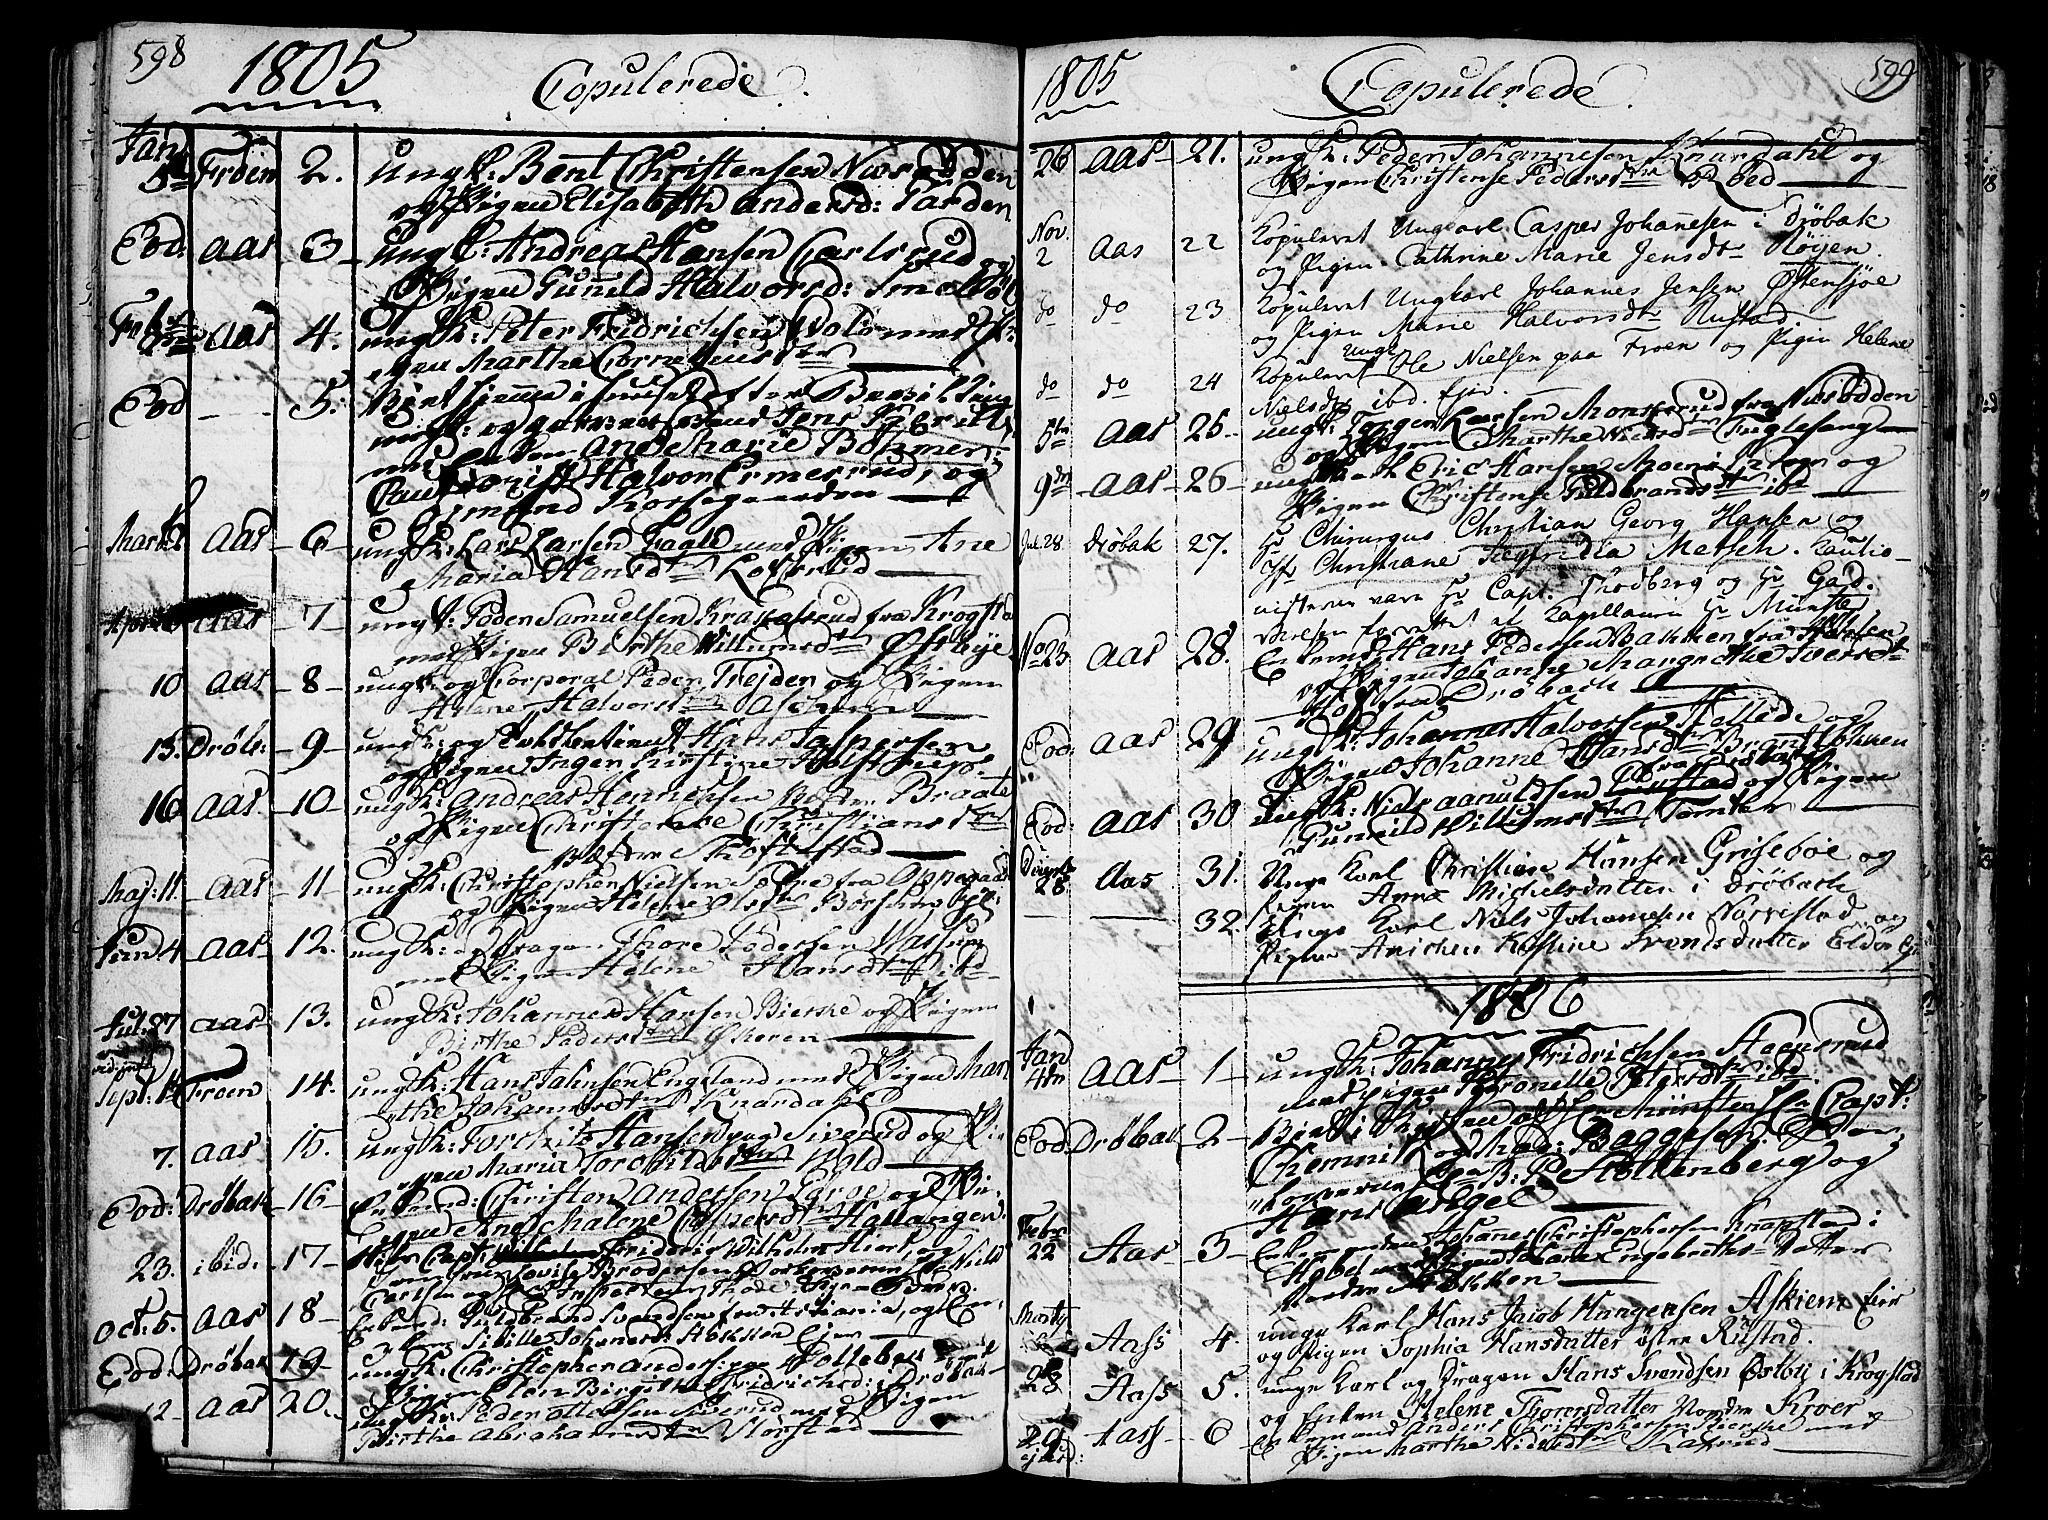 SAO, Ås prestekontor Kirkebøker, F/Fa/L0002: Ministerialbok nr. I 2, 1778-1813, s. 598-599